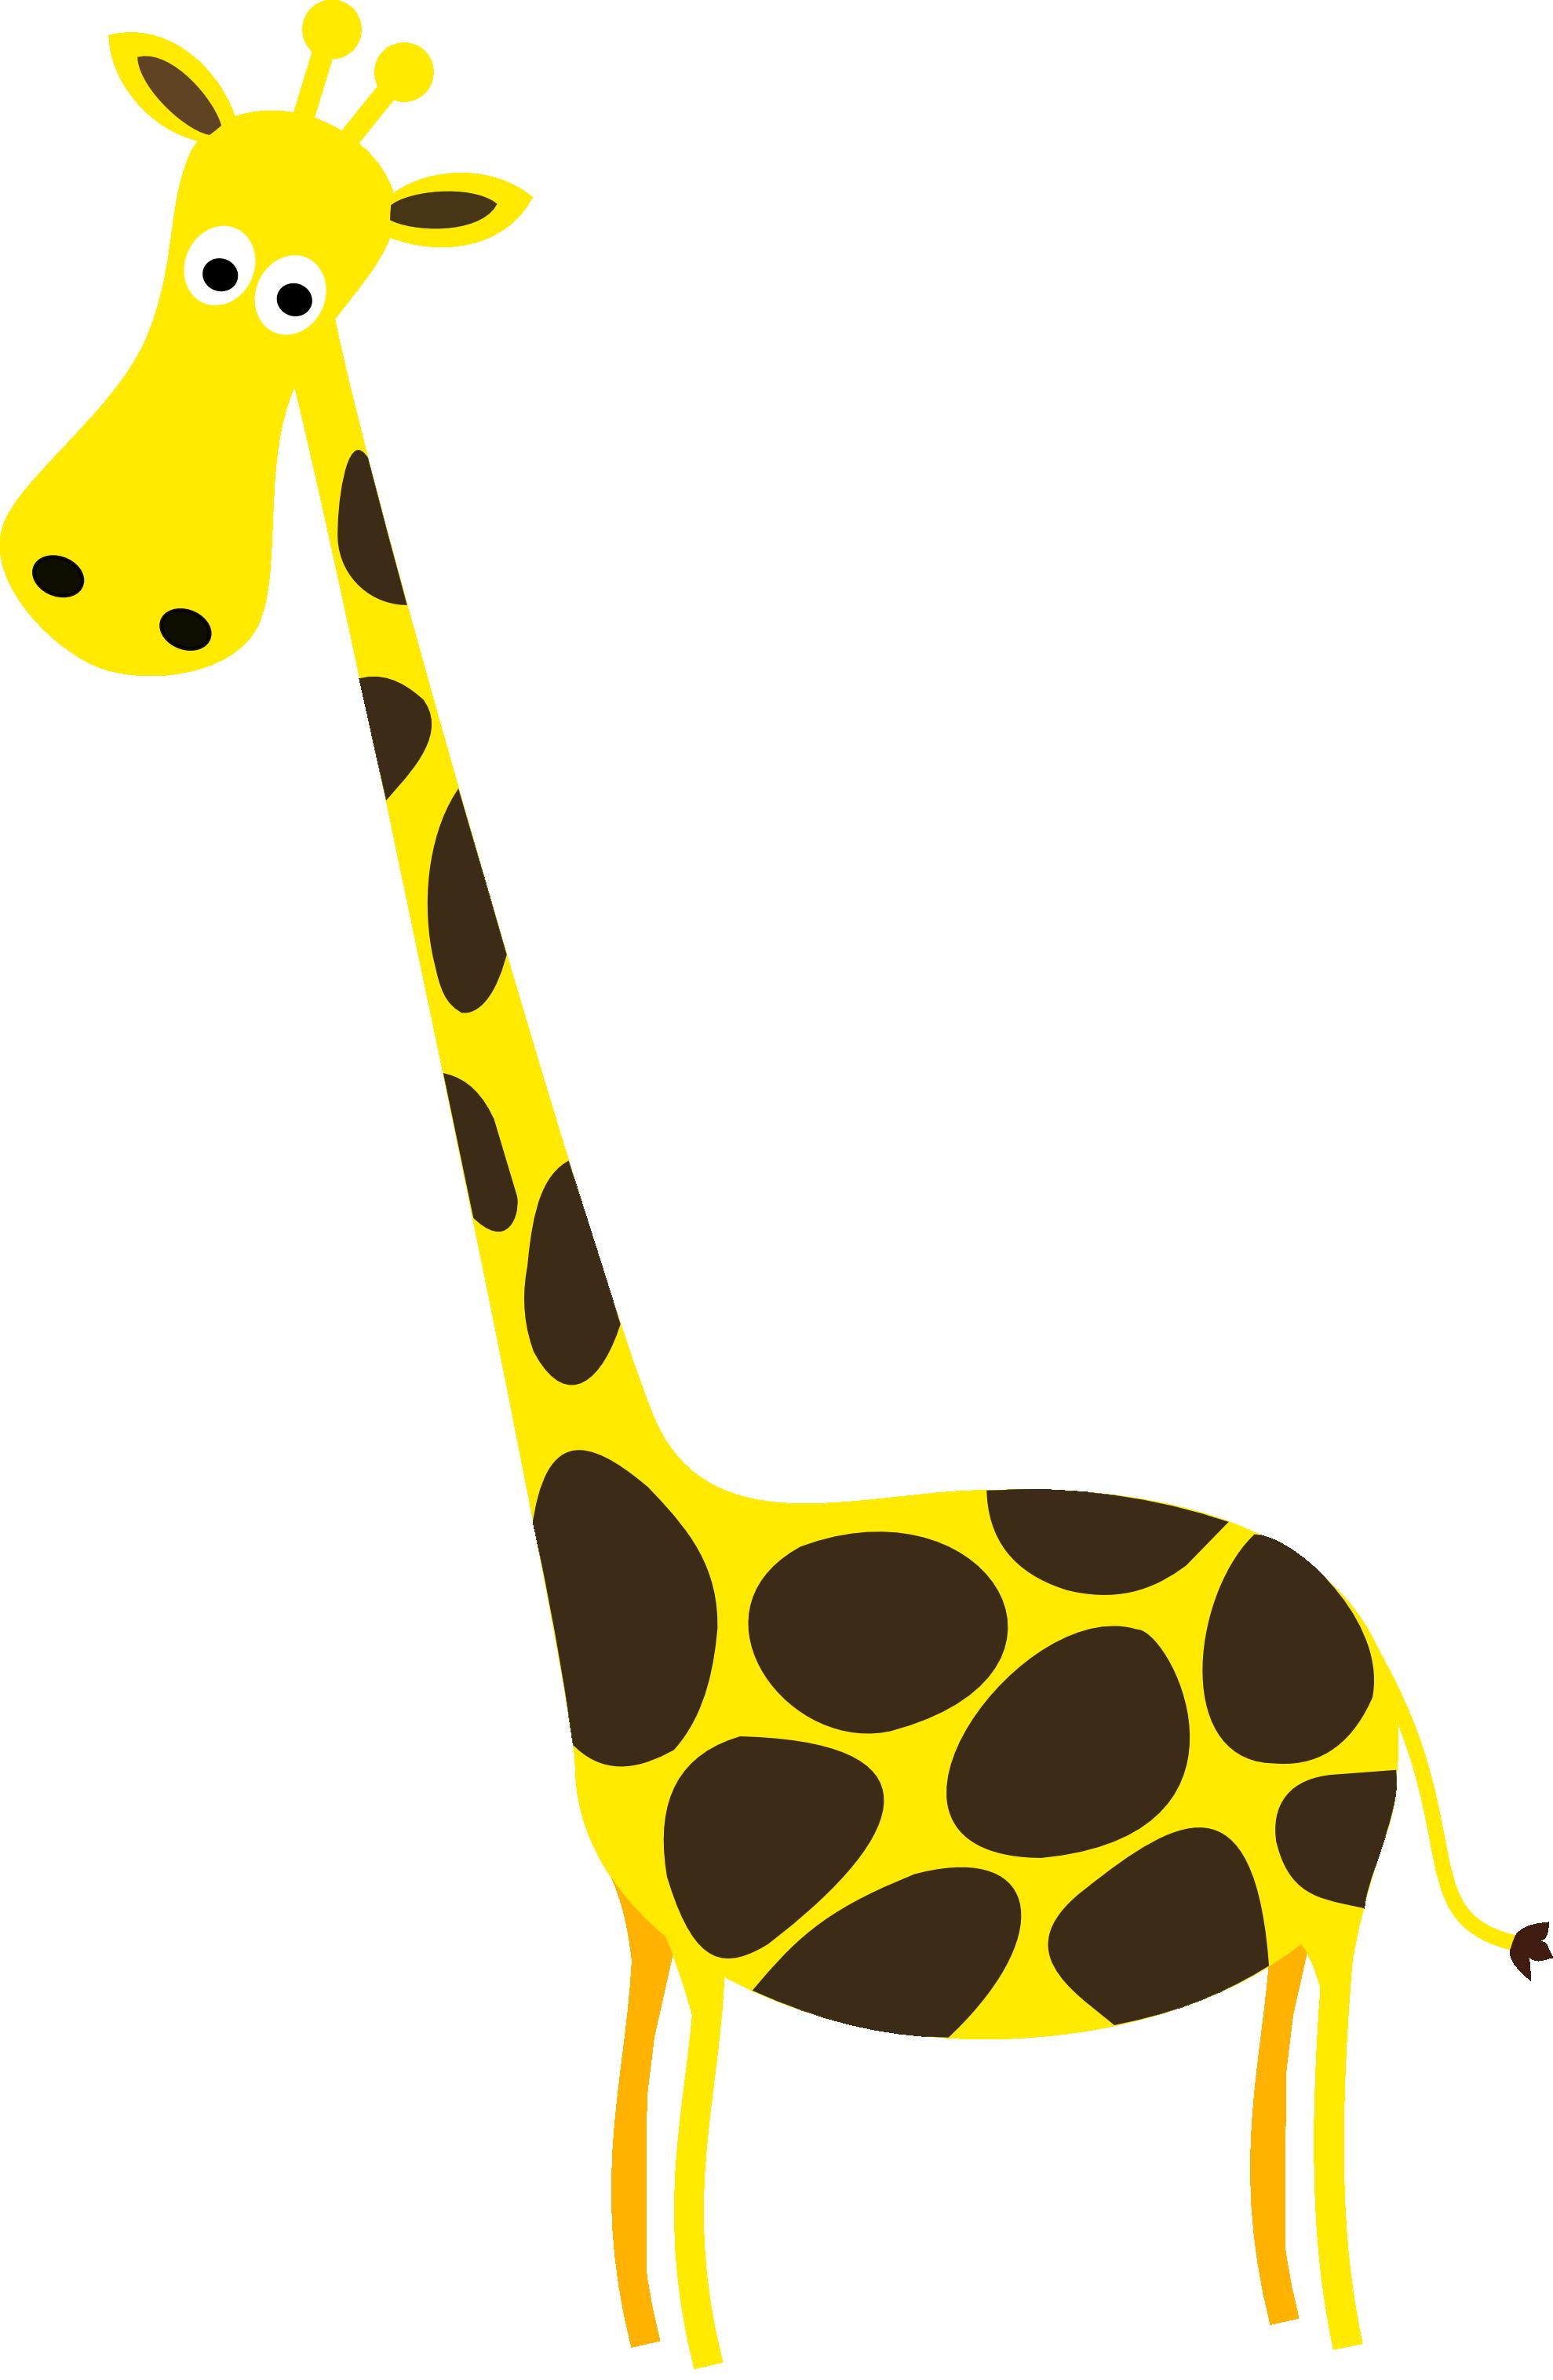 Giraffe clipart png clipart transparent stock Giraffe PNG Transparent Images   PNG All clipart transparent stock